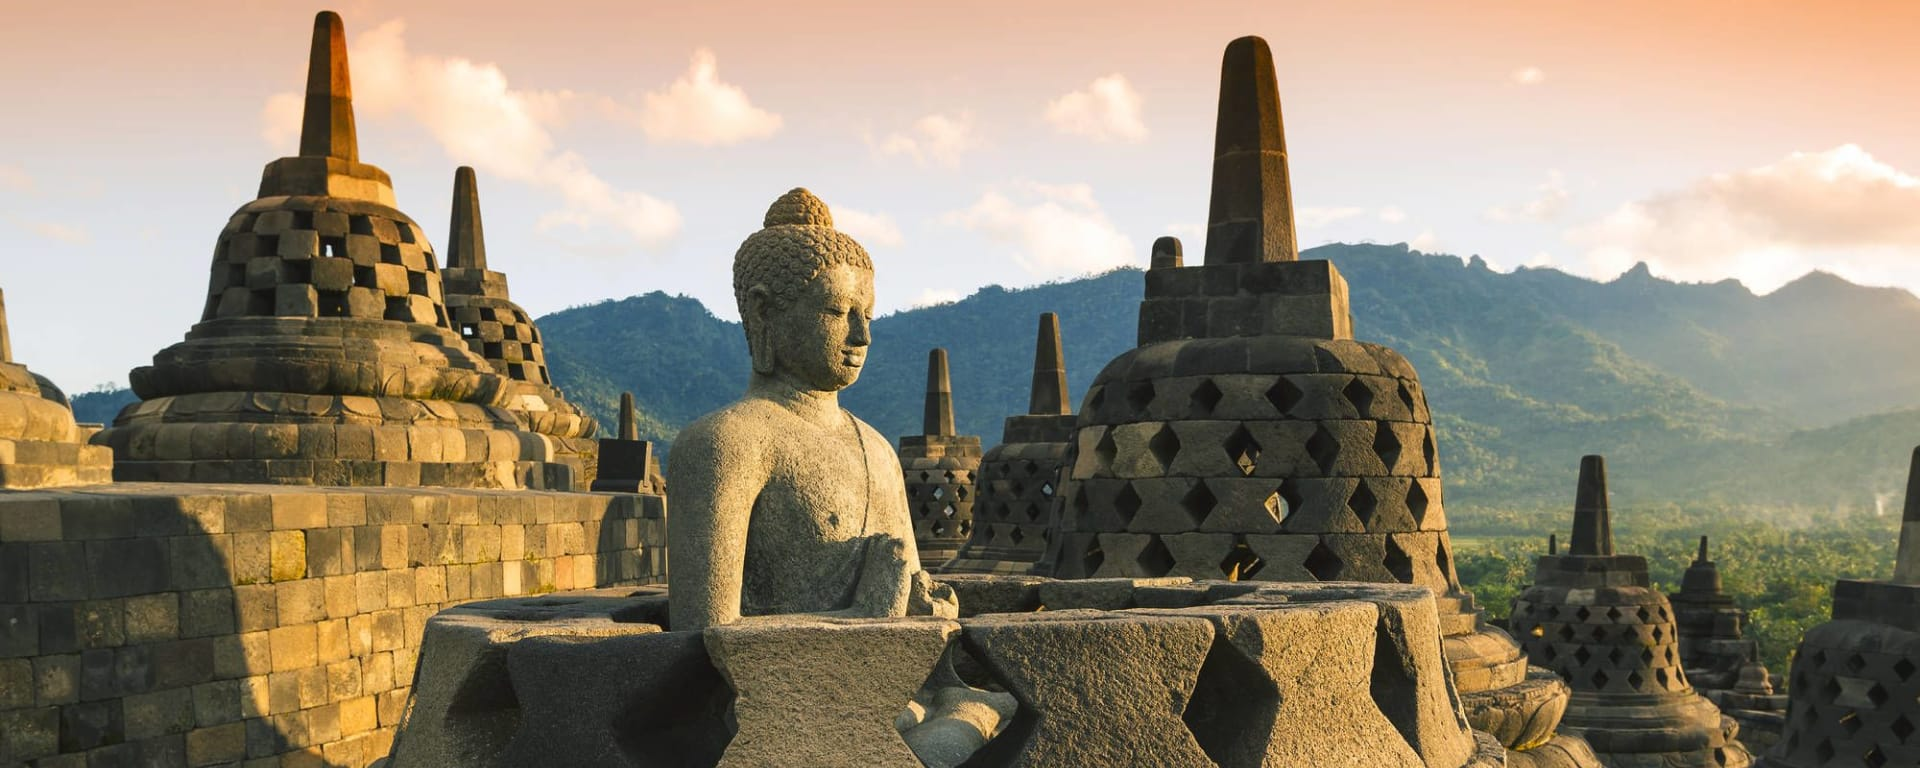 Java-Bali pour les fins connaisseurs de Yogyakarta: Yogyakarta Borobudur at Sunset